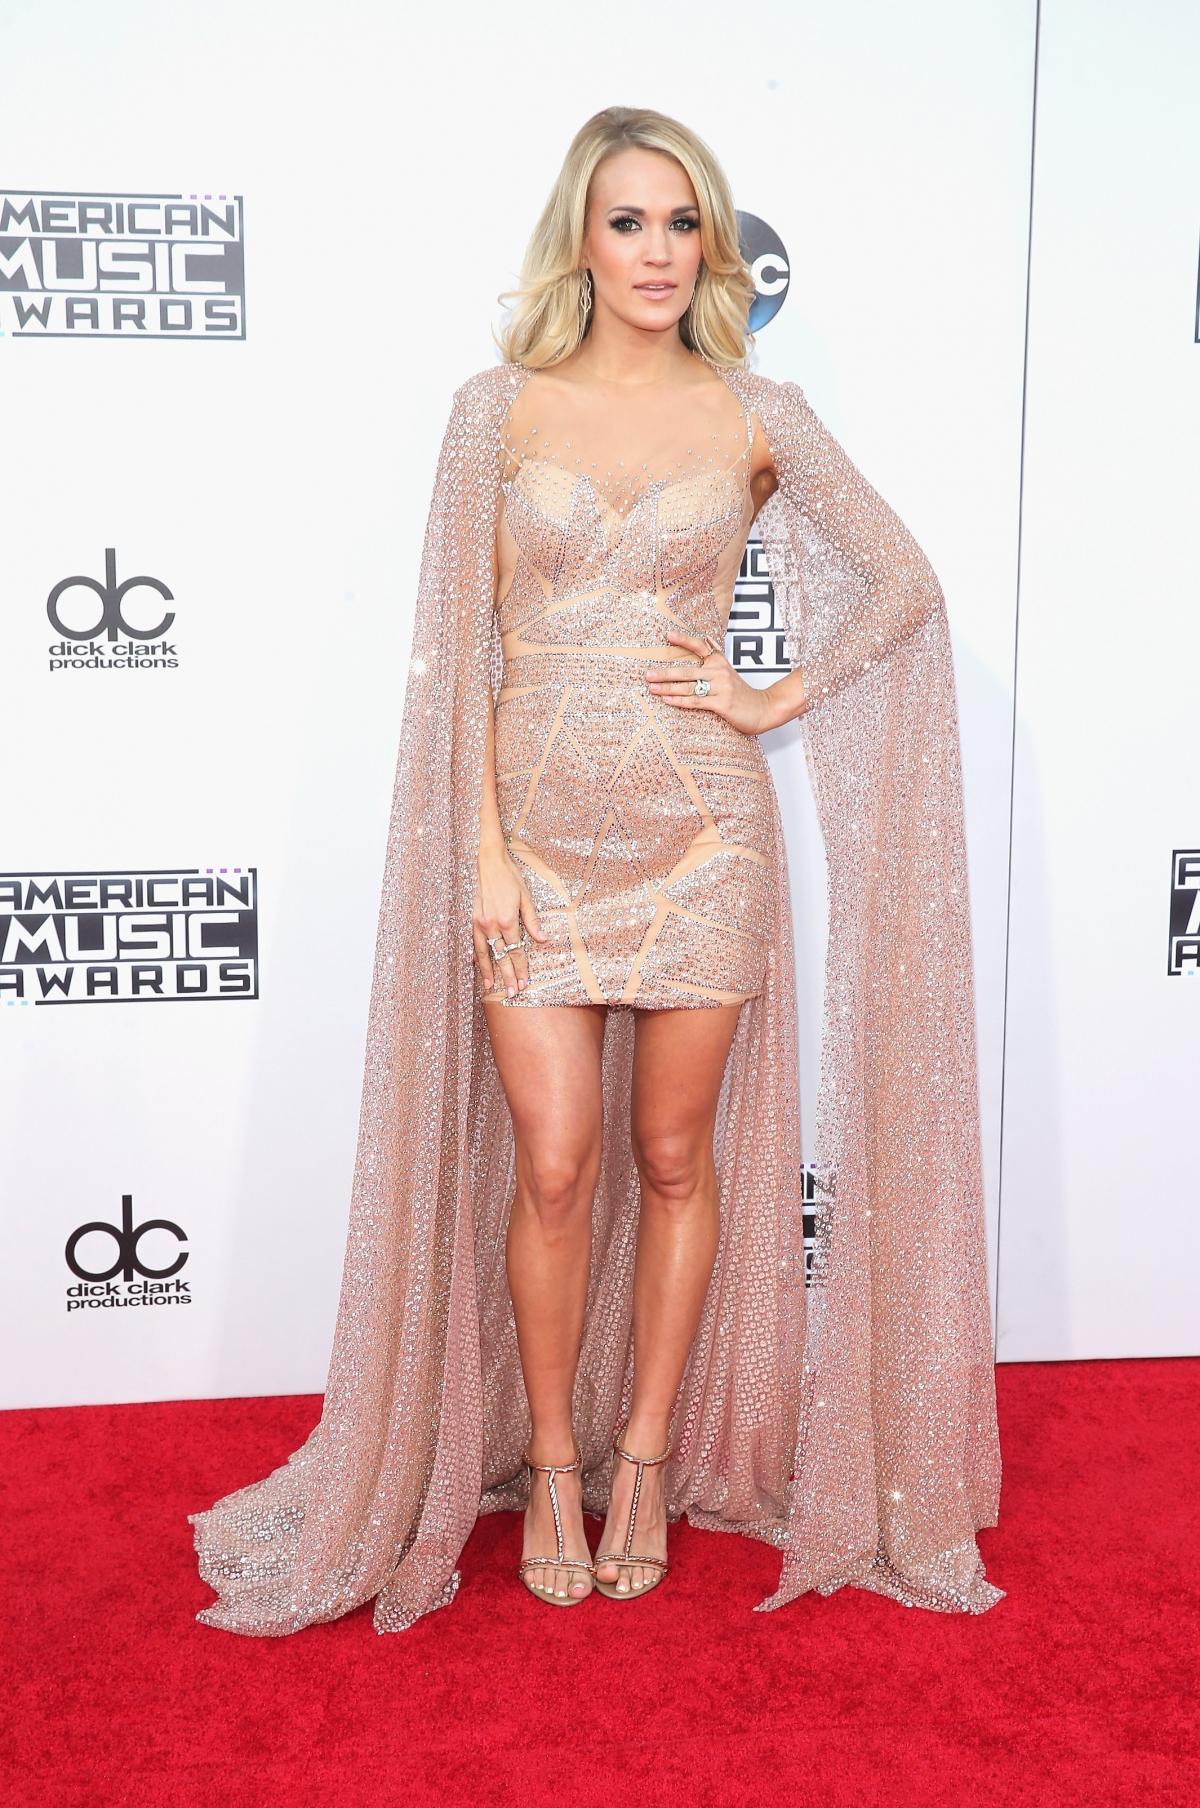 2015 American Music Awards